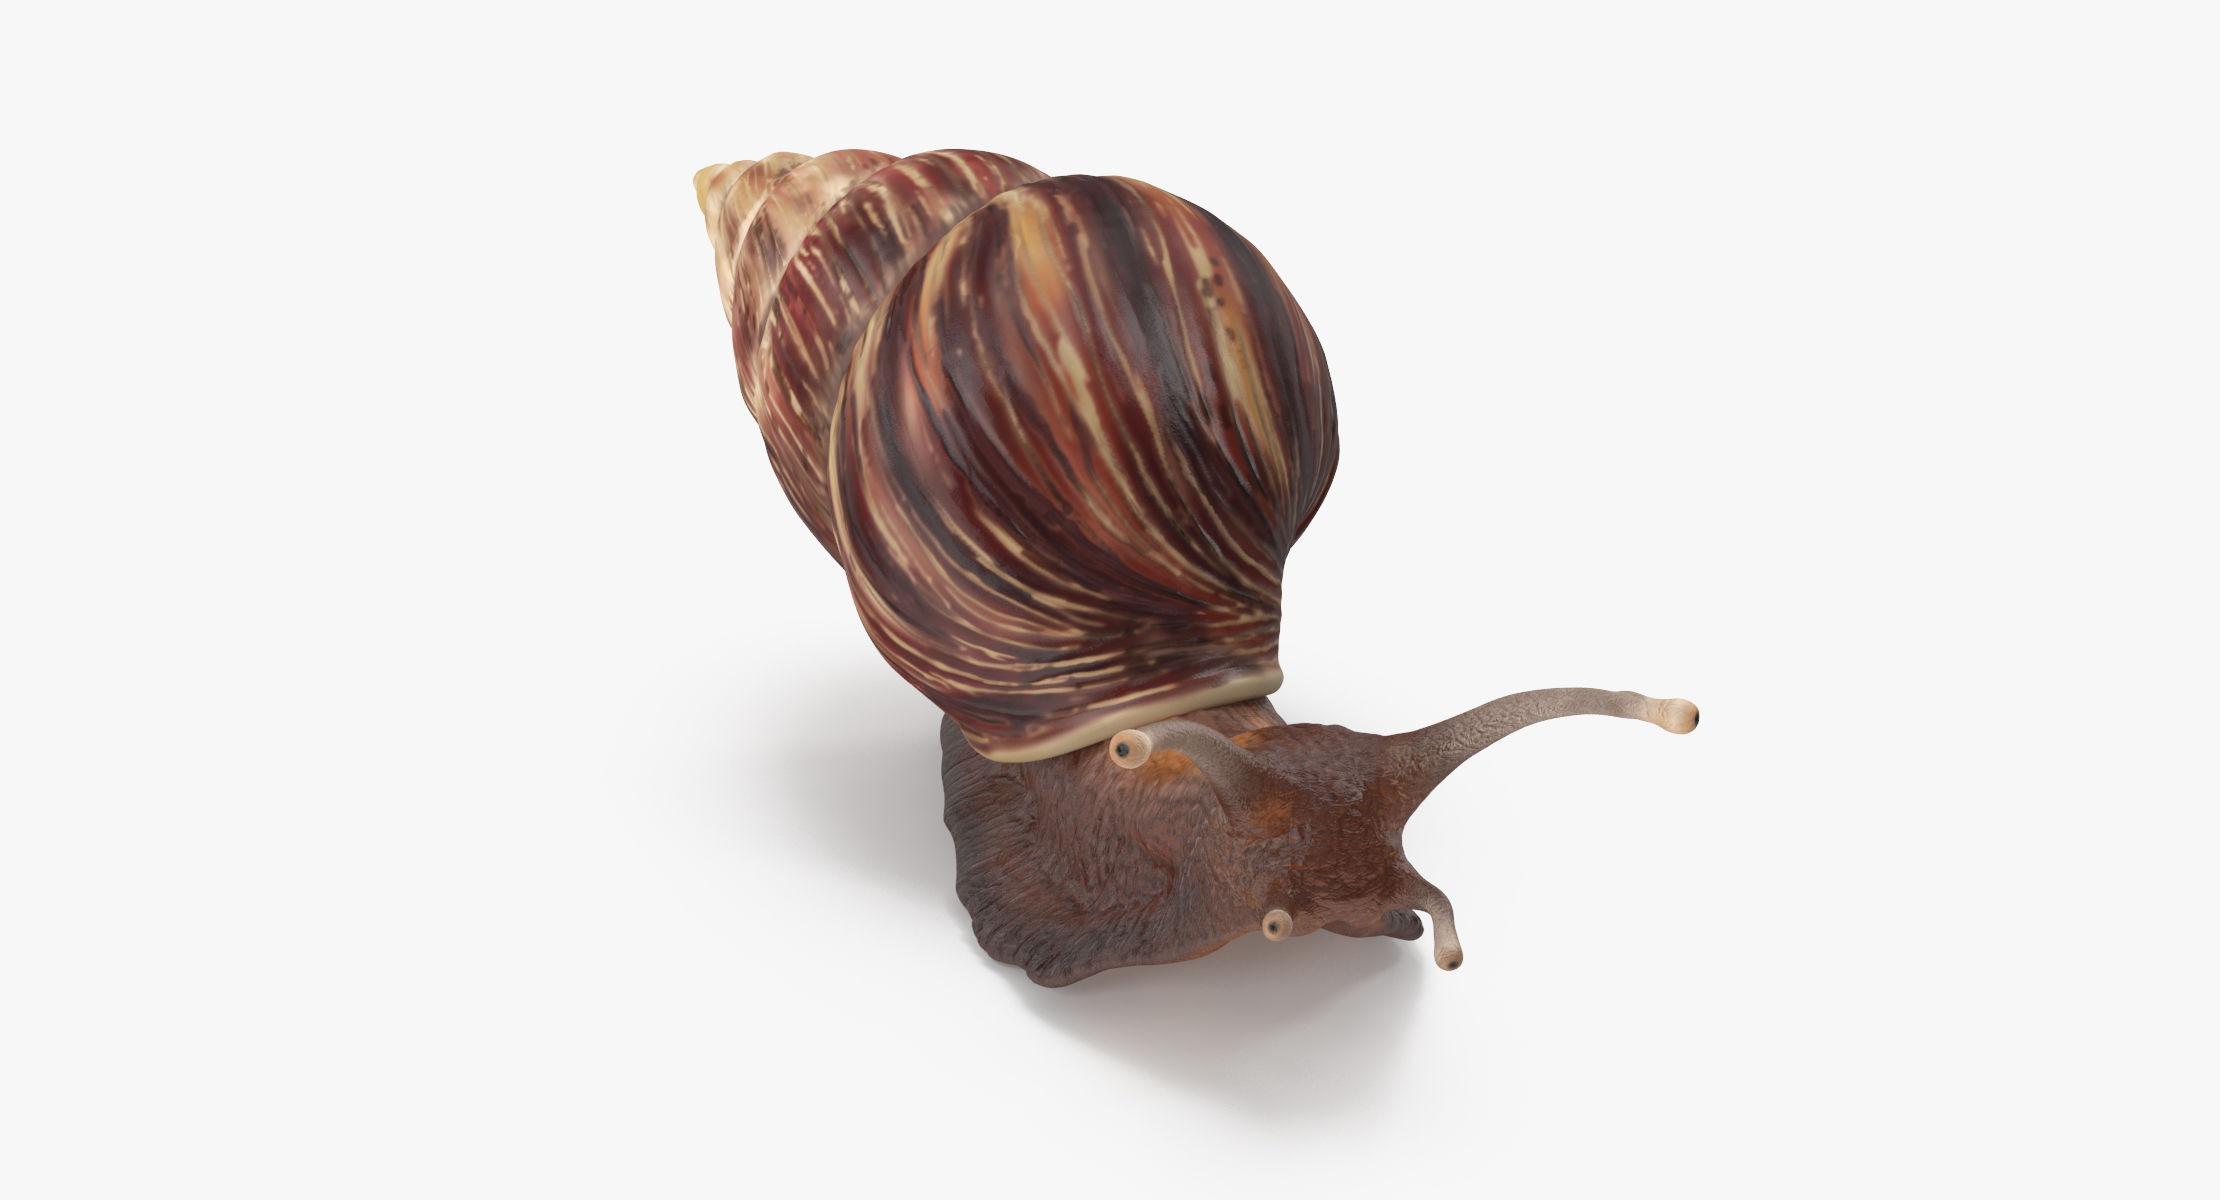 Grove snail 03 - reel 1